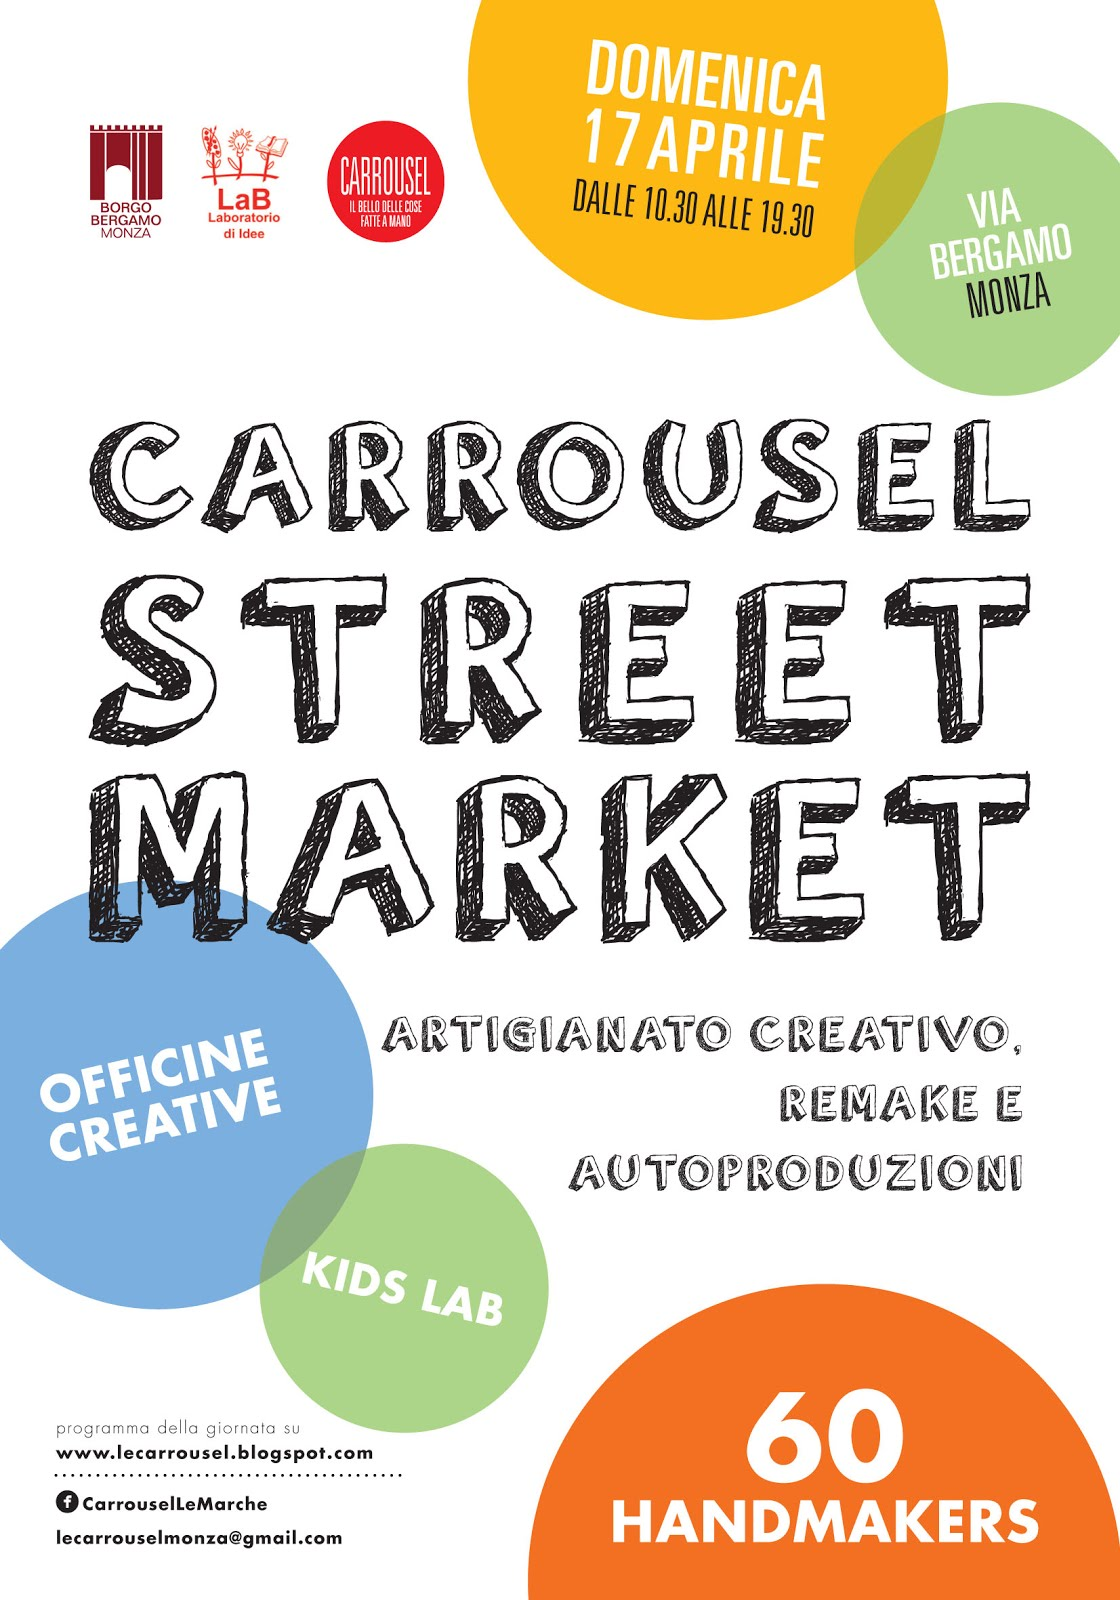 Carrousel StreetMarket 17 aprile